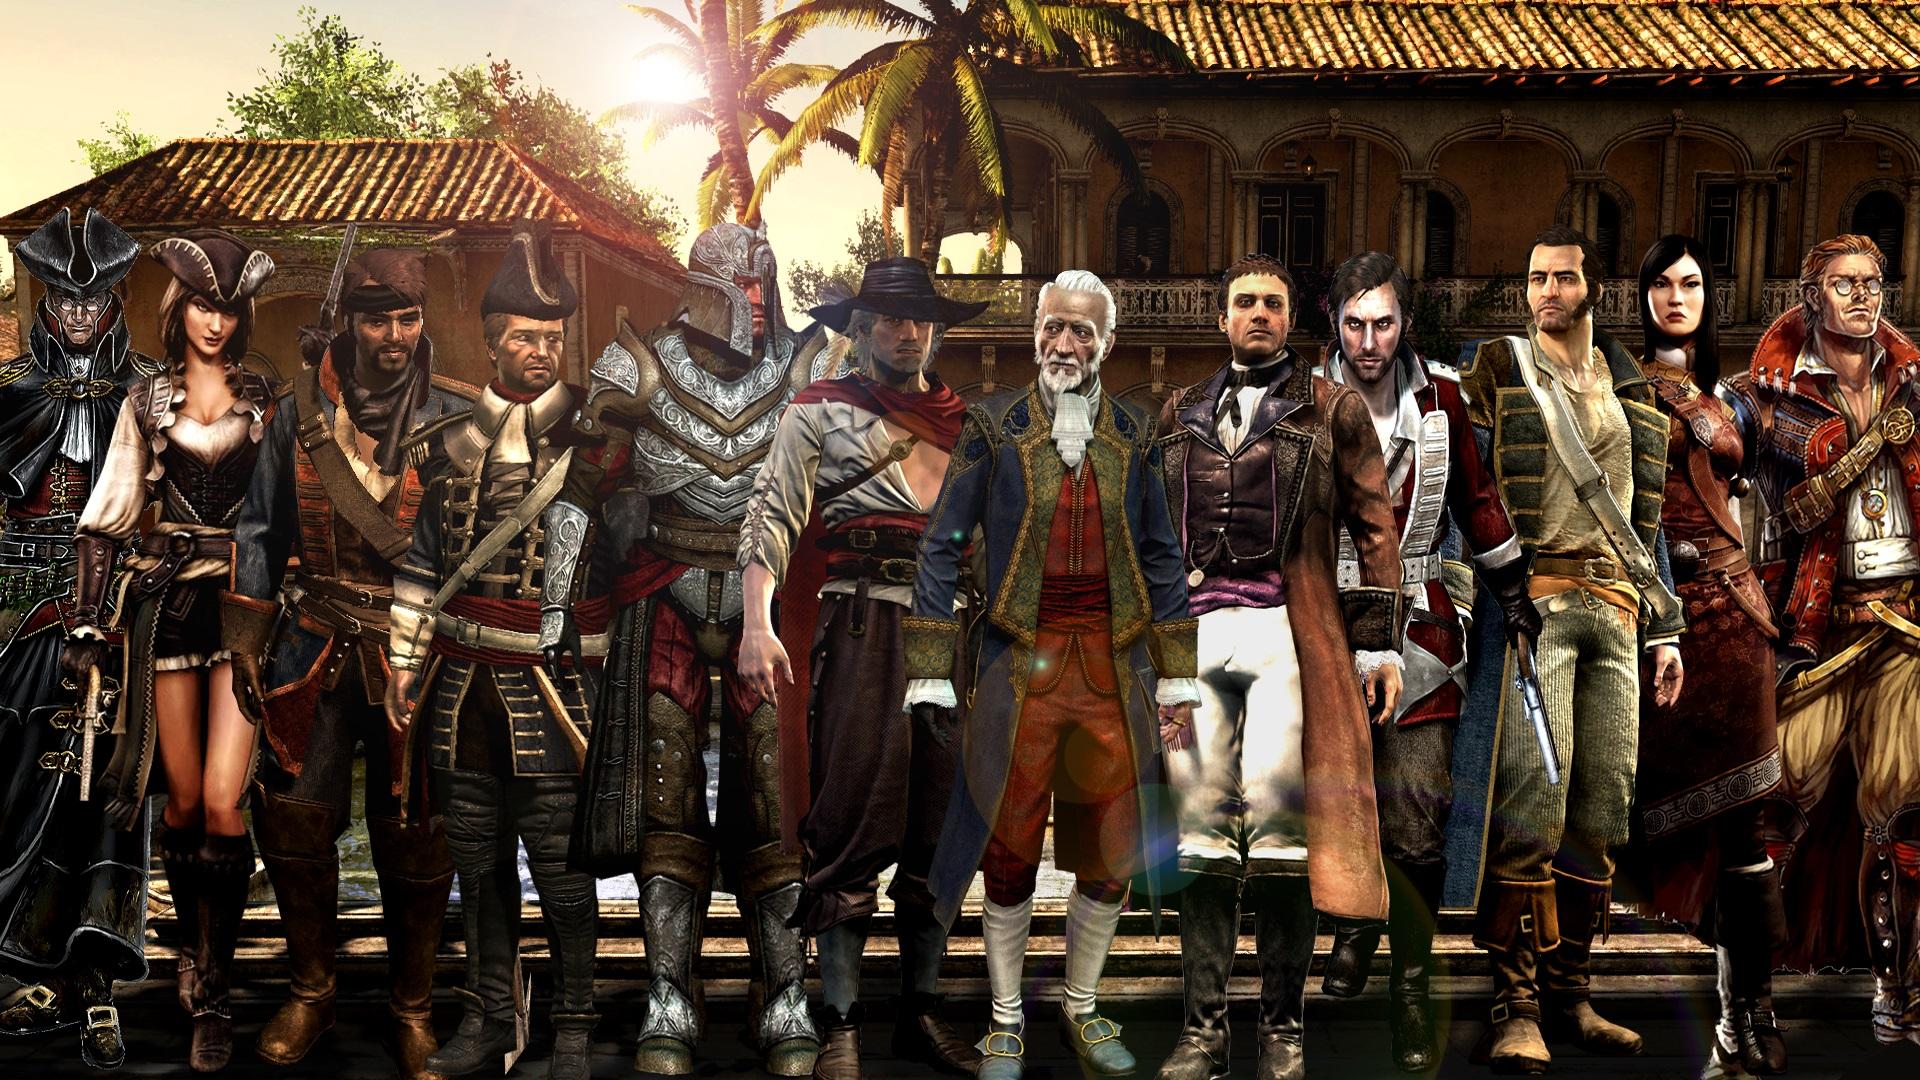 templars the assassins - photo #8